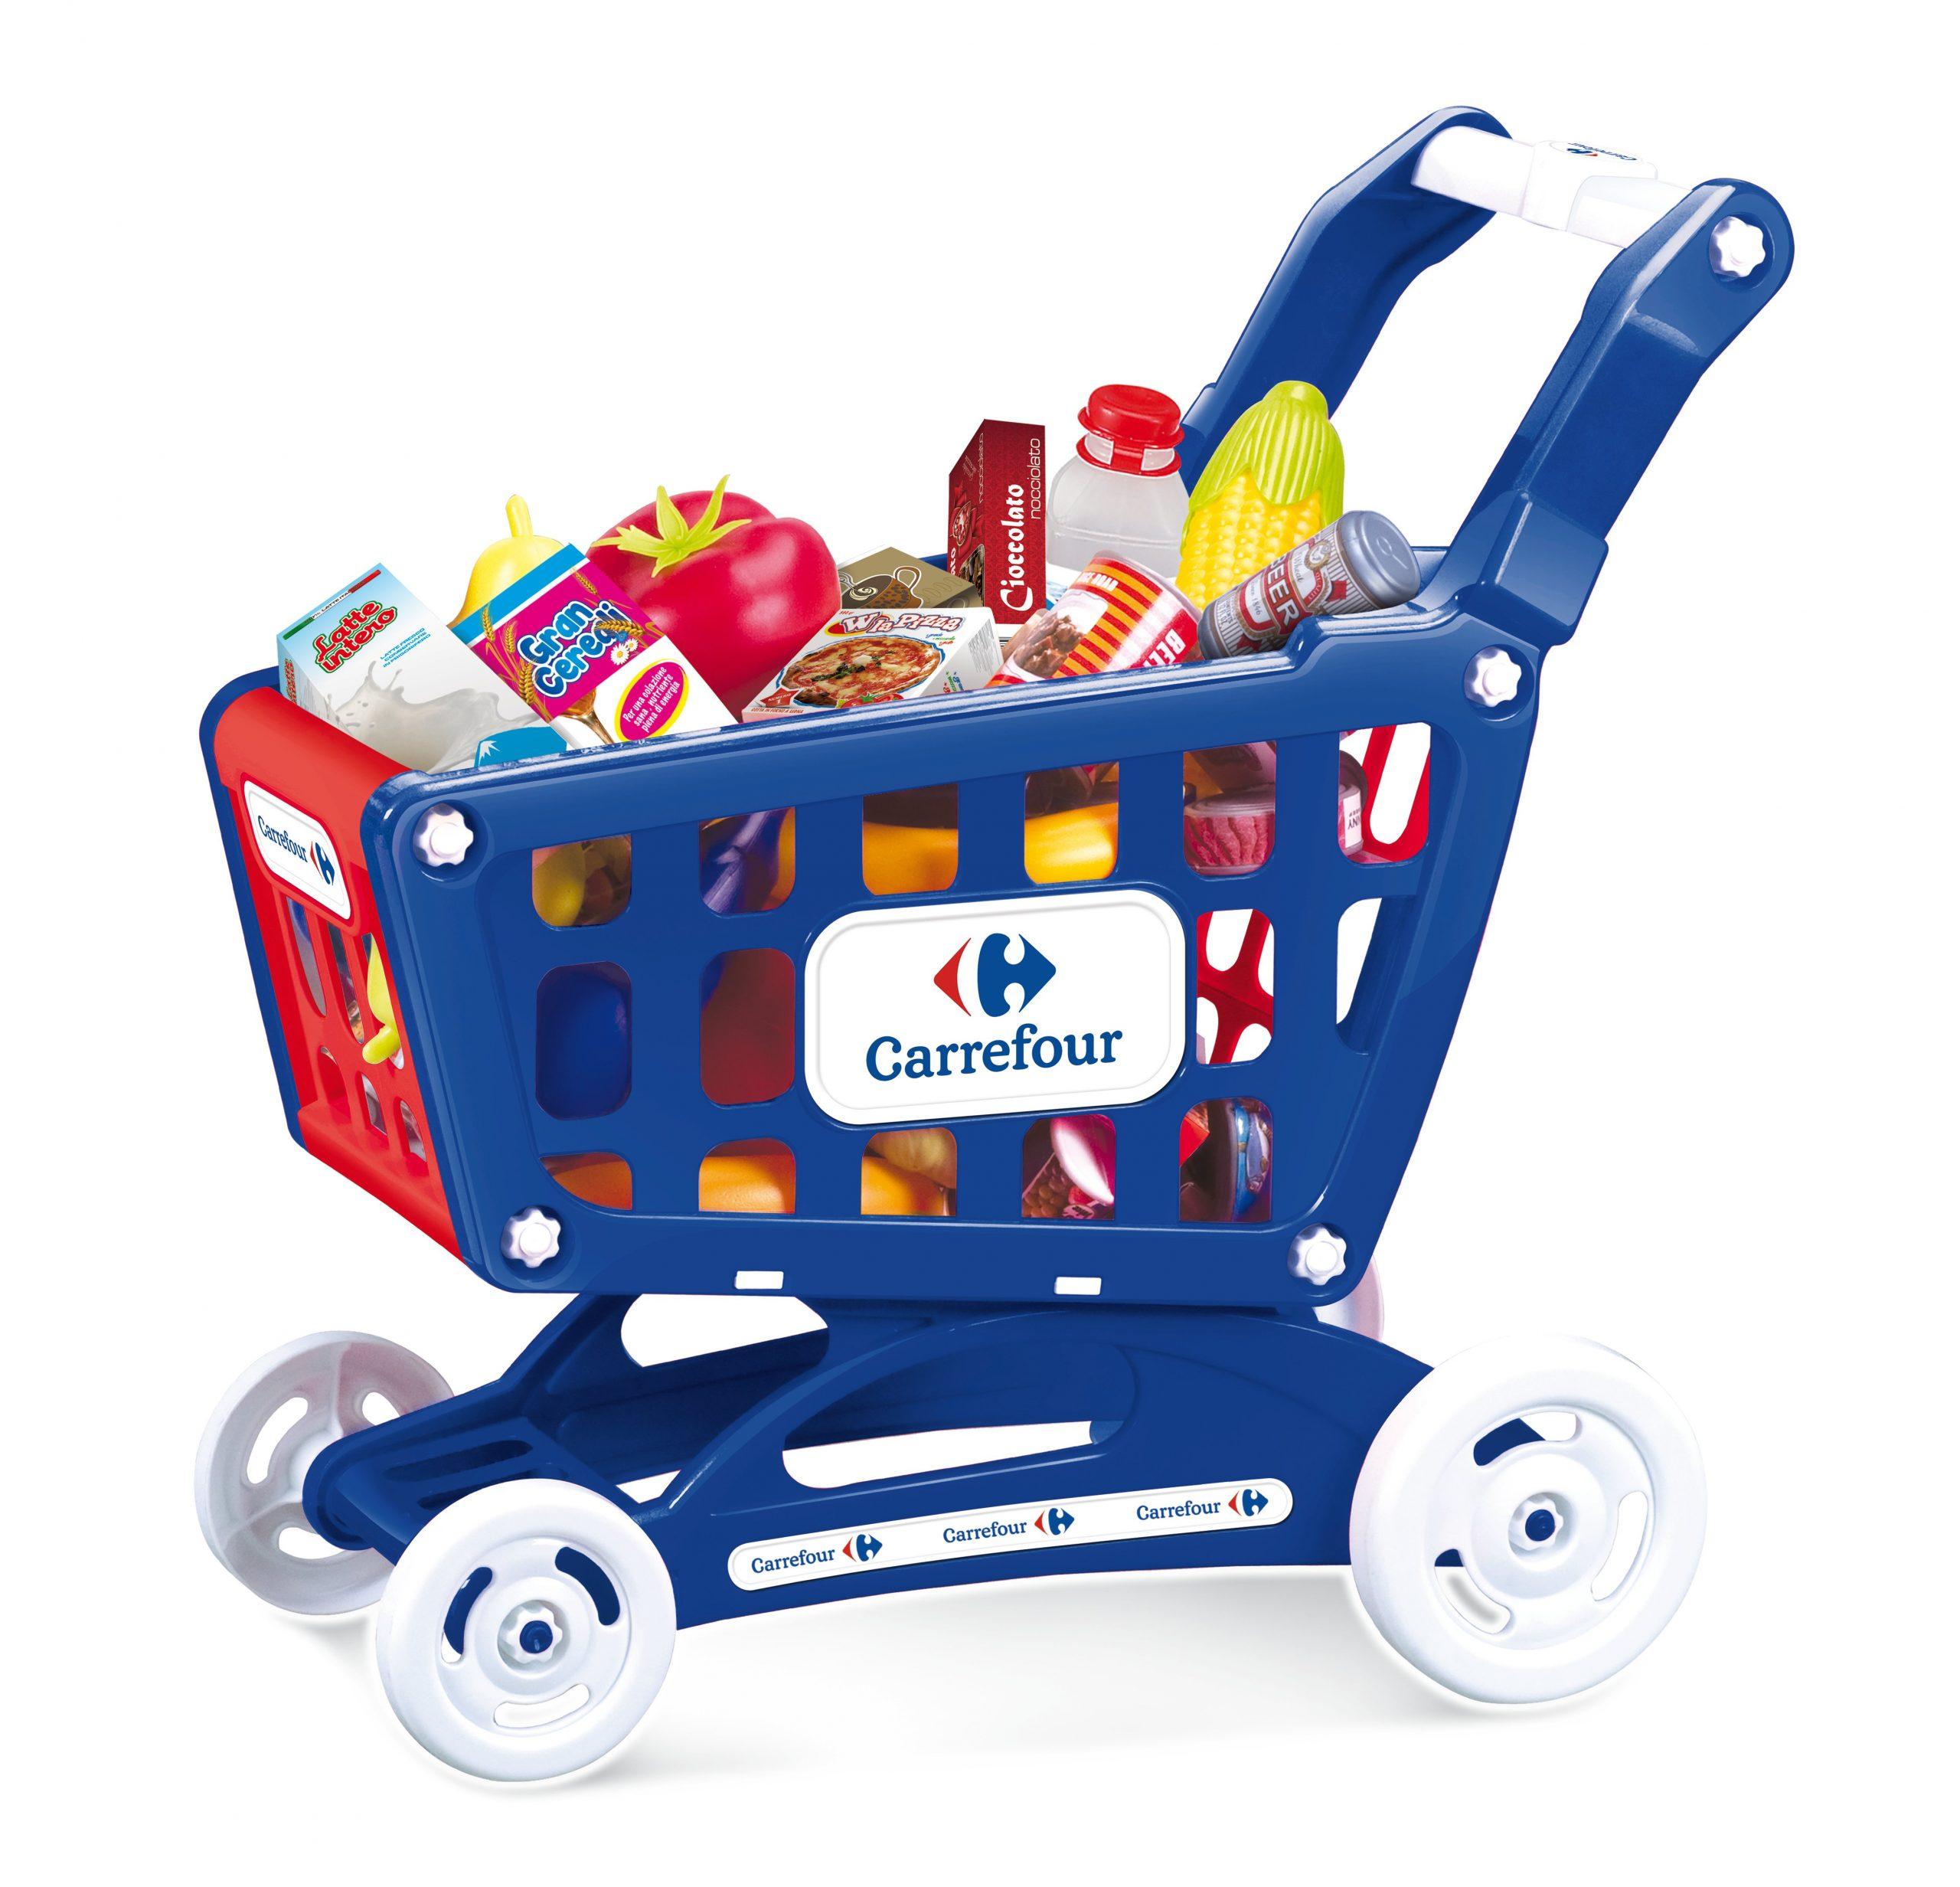 Carrelli Comprare Carrefour